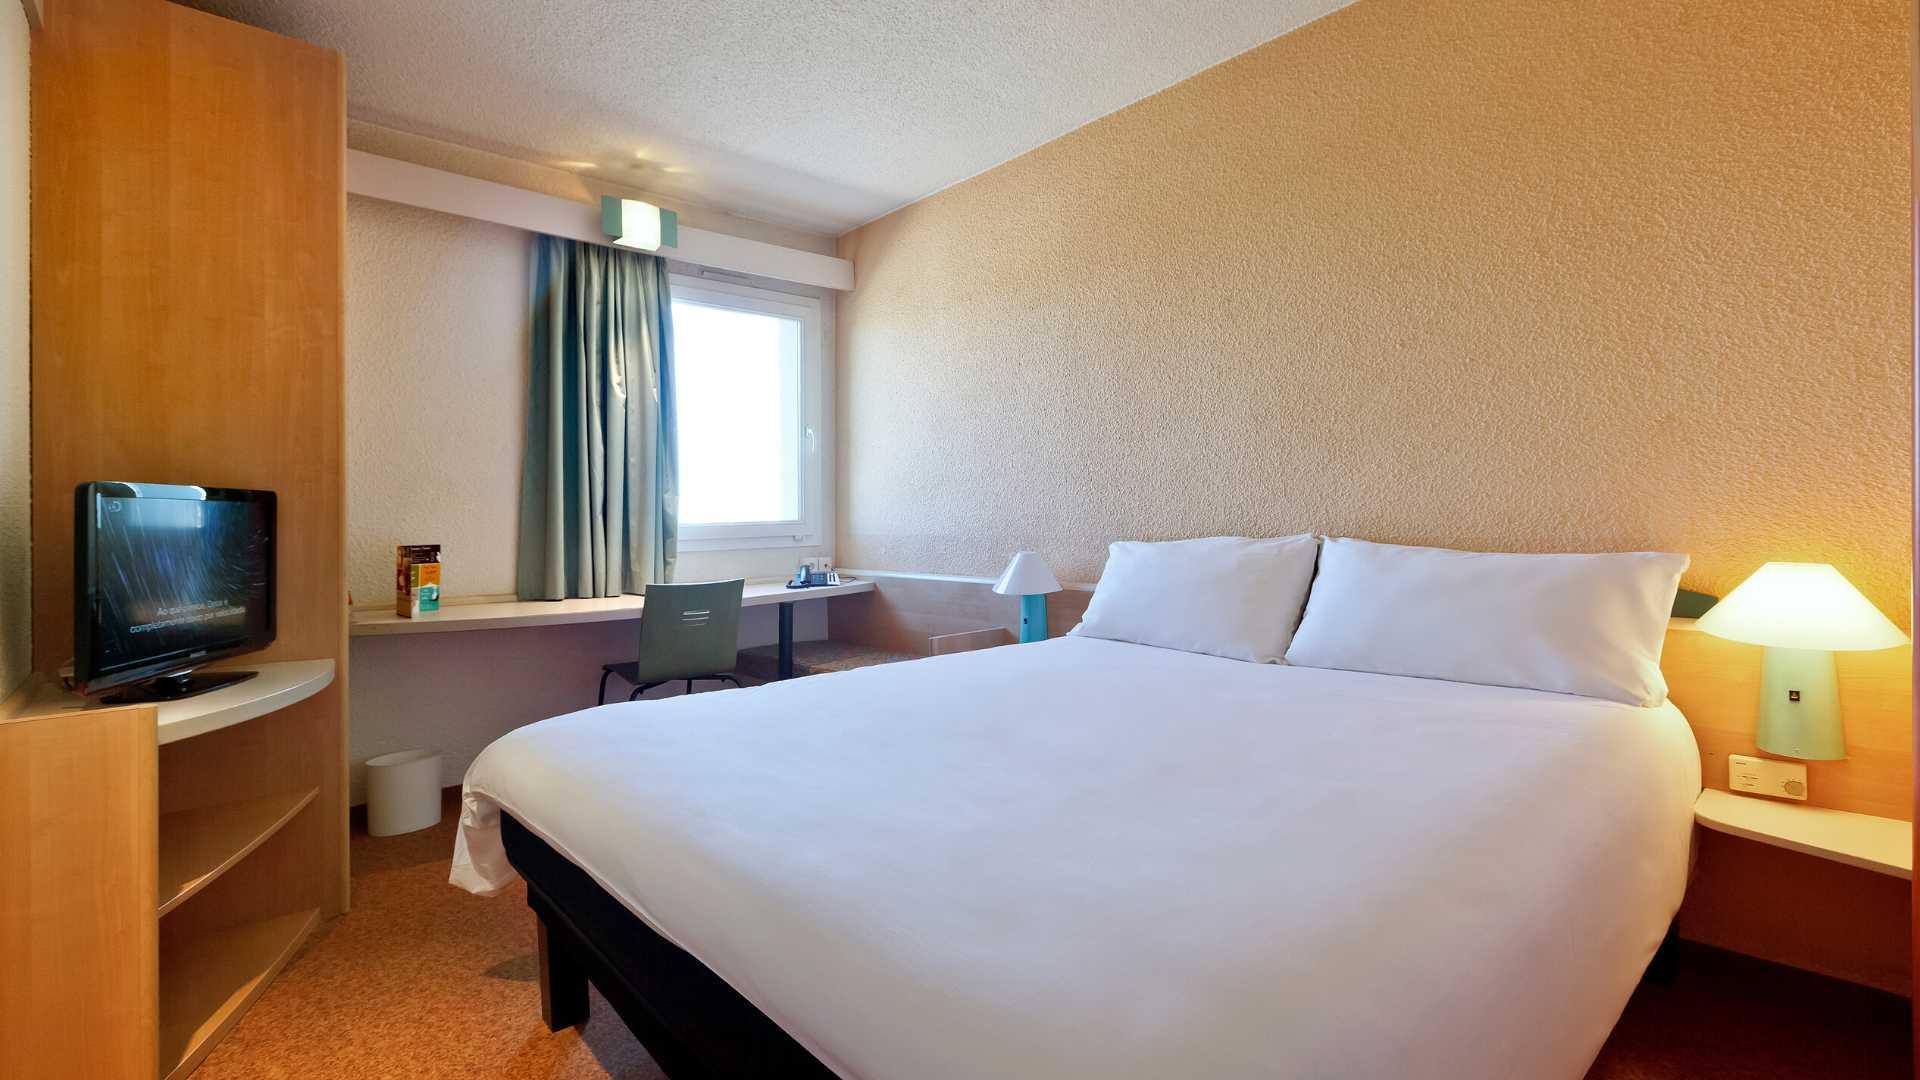 IBIS HOTEL ALICANTE